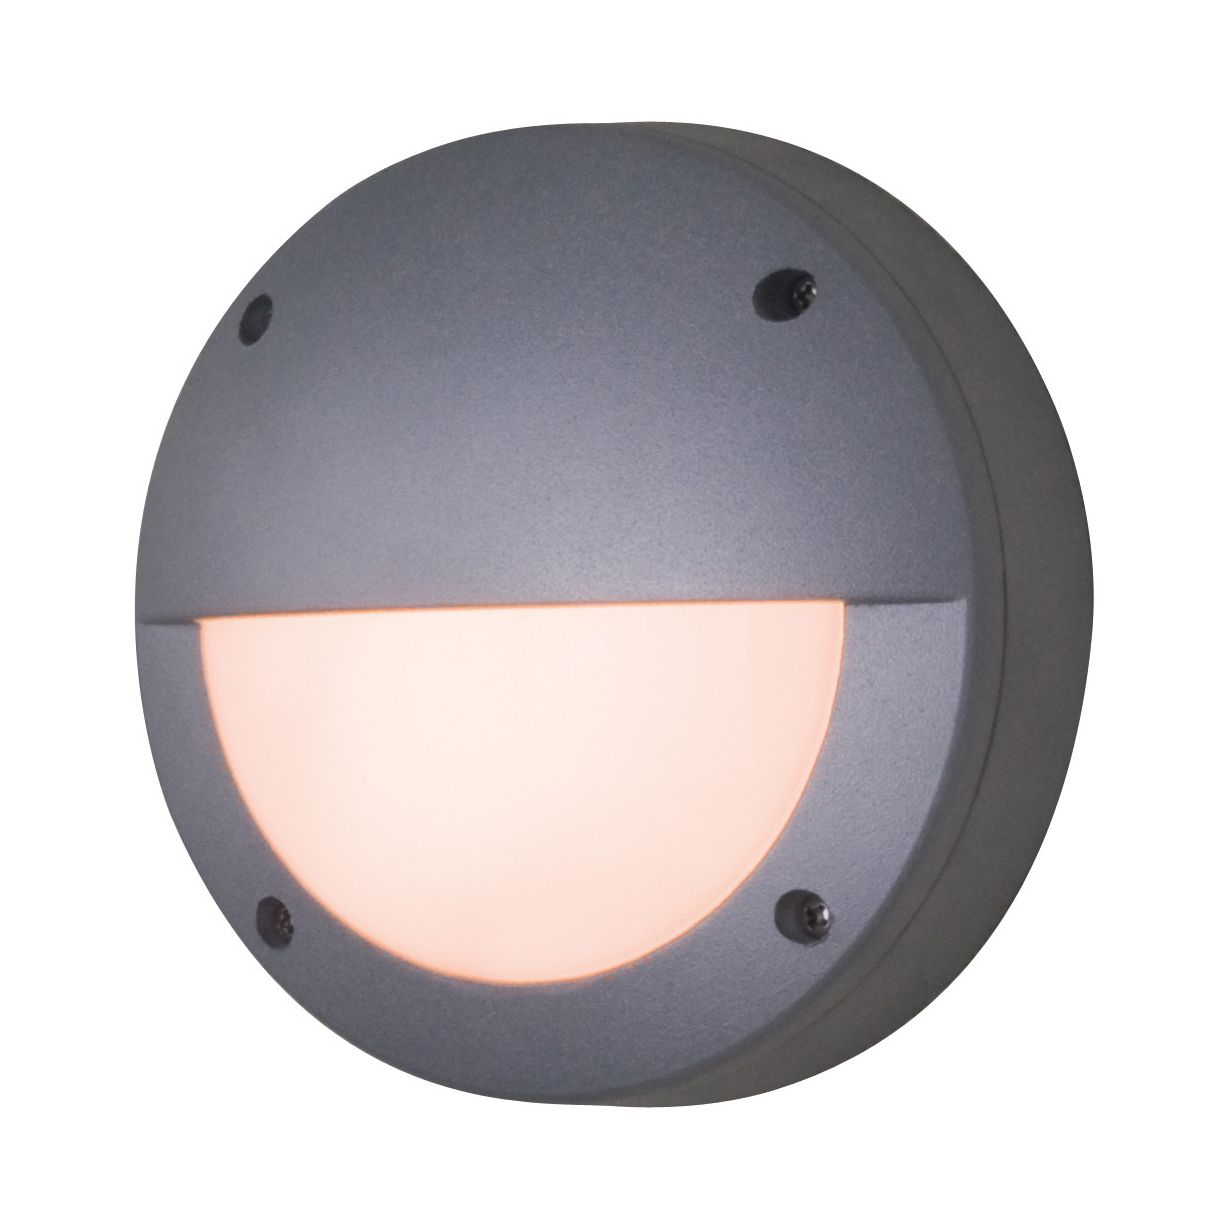 home24 LED Aussen-Wand- Deckenleuchte 1-flammig